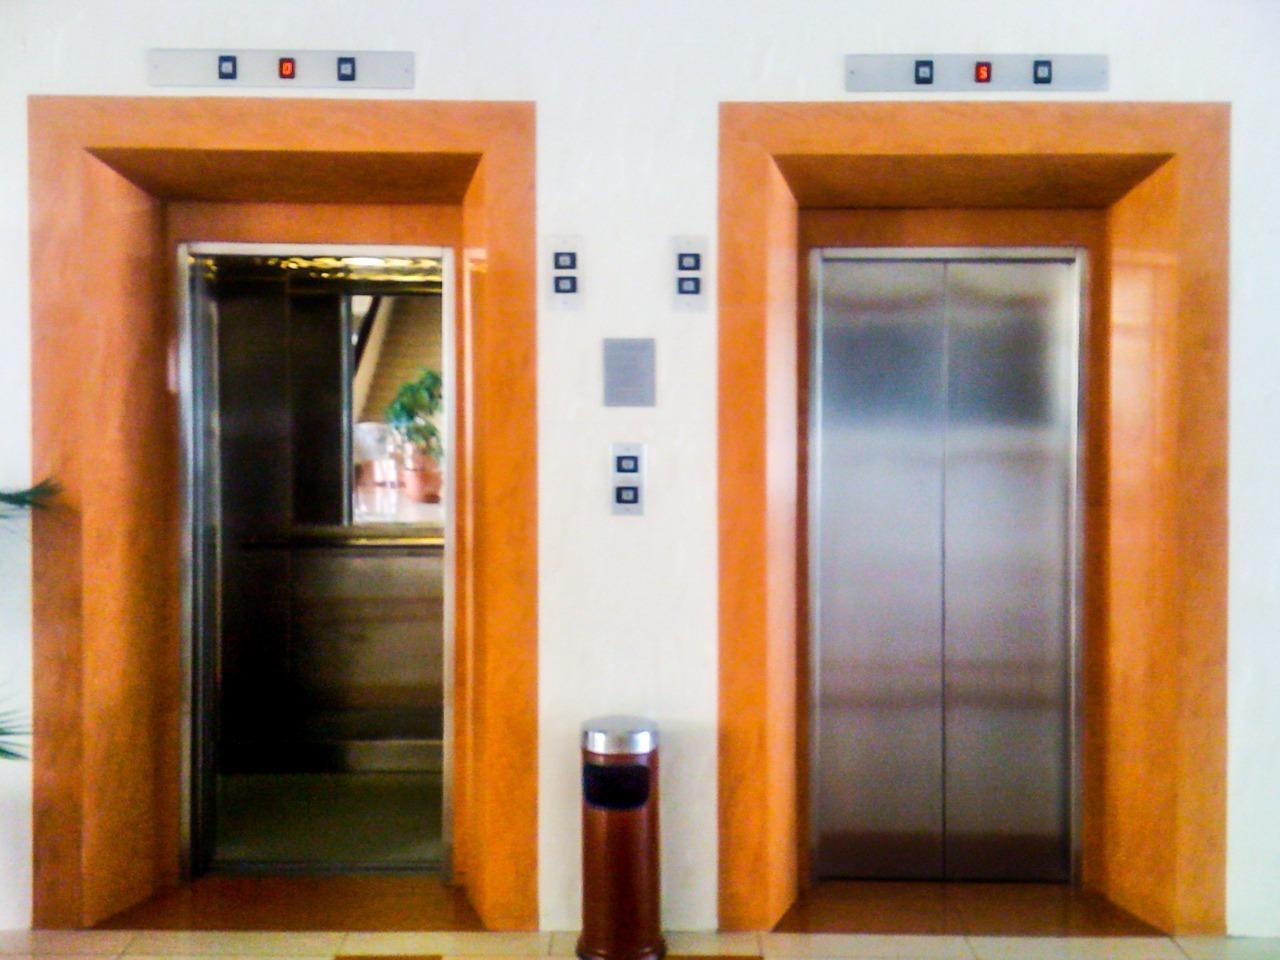 zlift-erga-lifts-13 Εγκατάσταση Ανελκυστήρα - Ρόδος